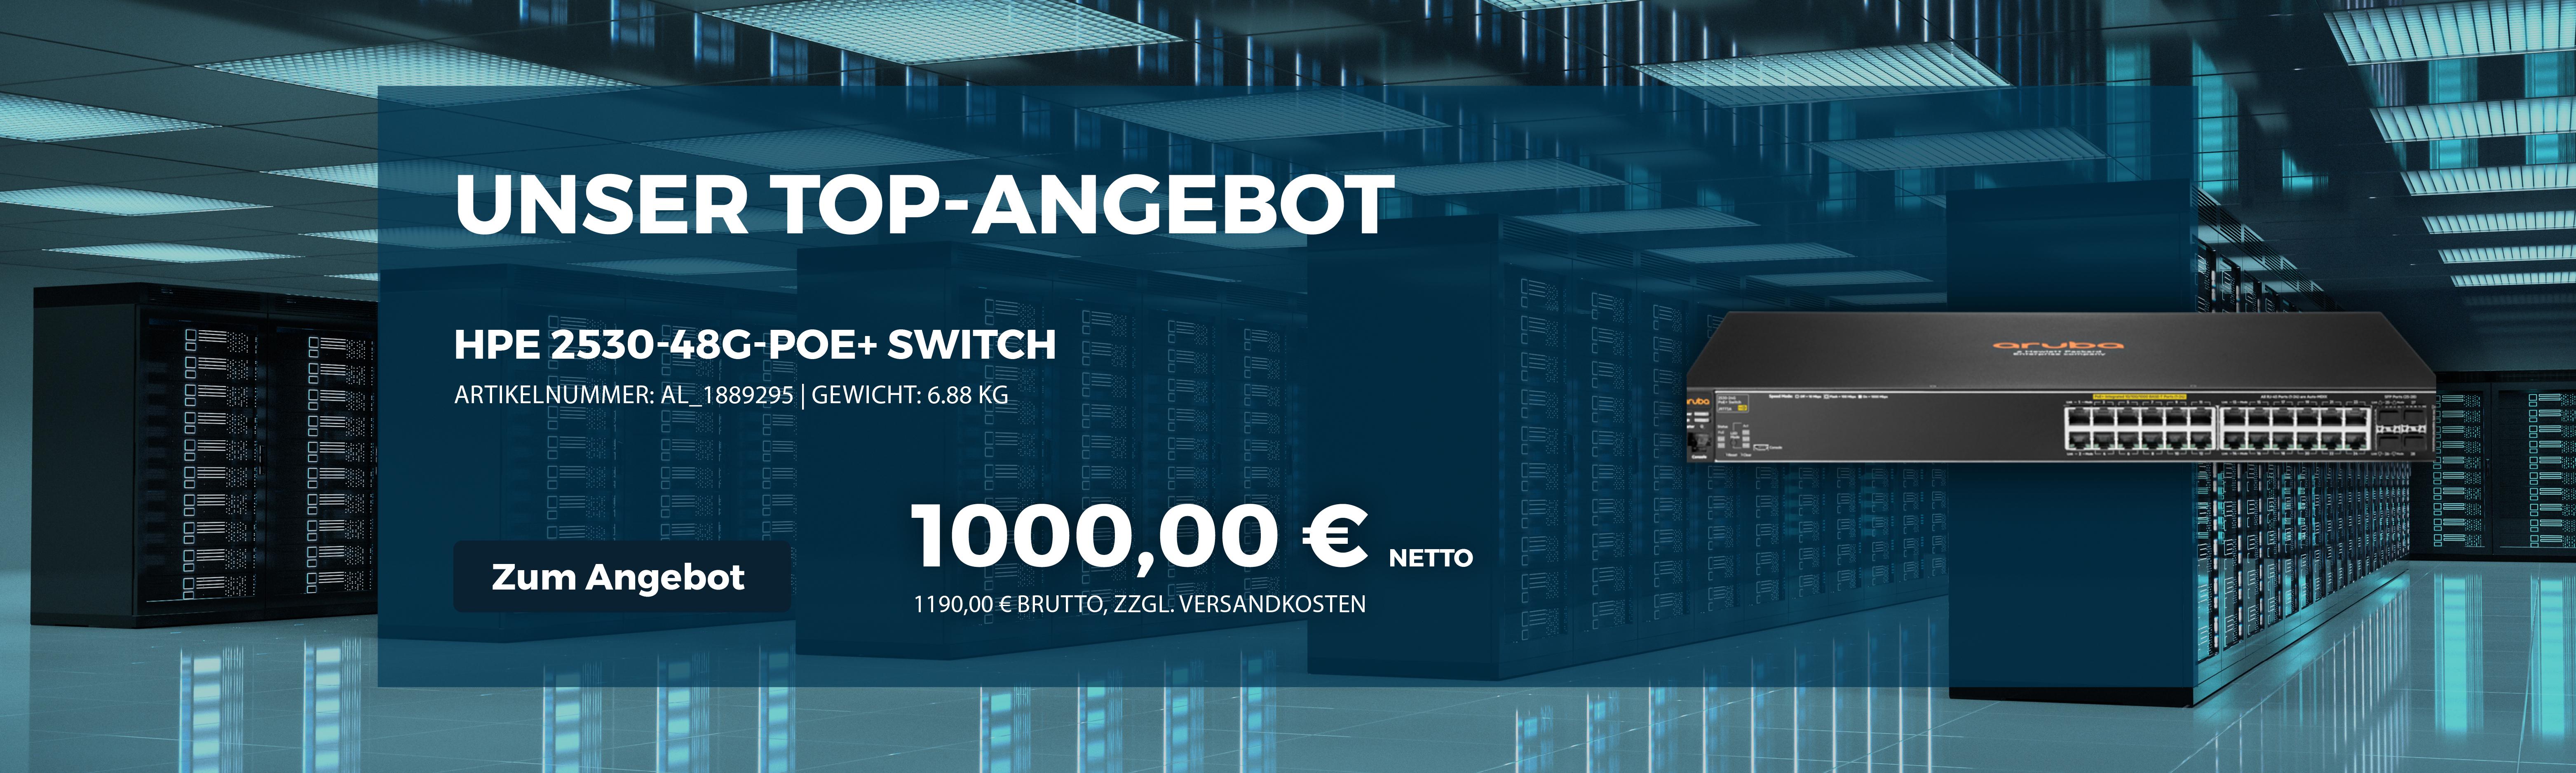 % Angebot - HPE 2530-48G-PoE+ Switch